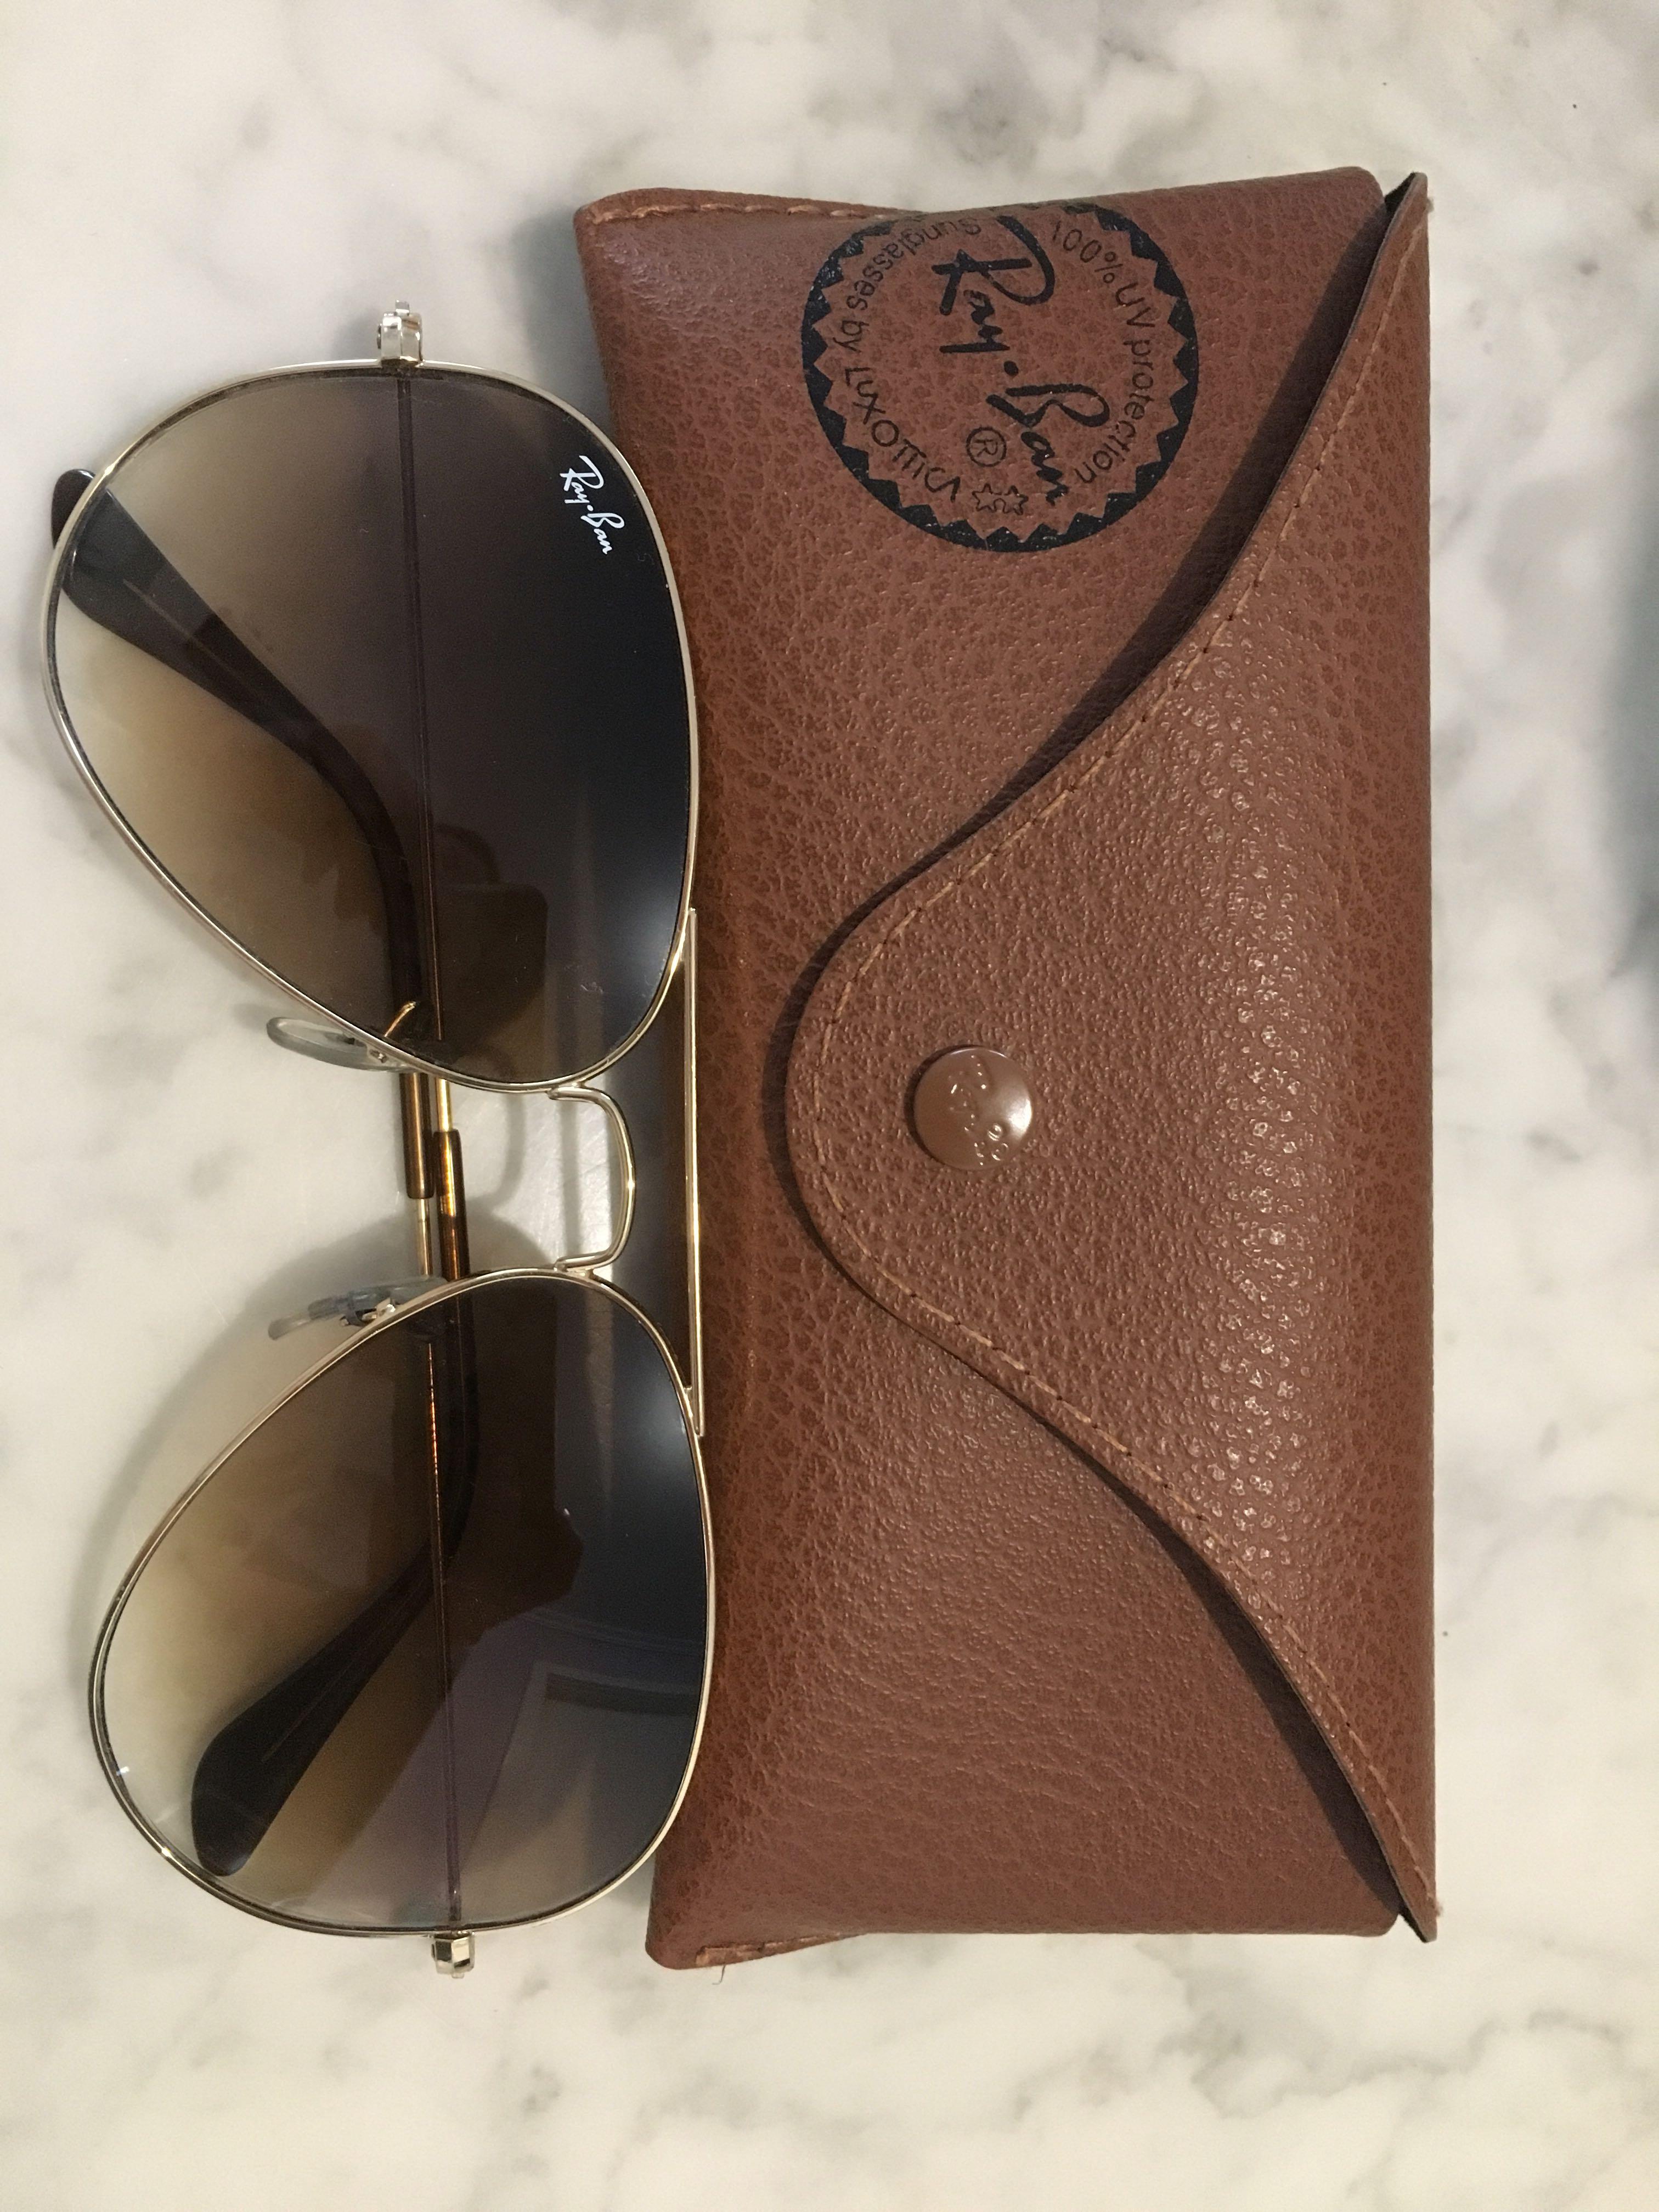 Rayban gradient sunglasses